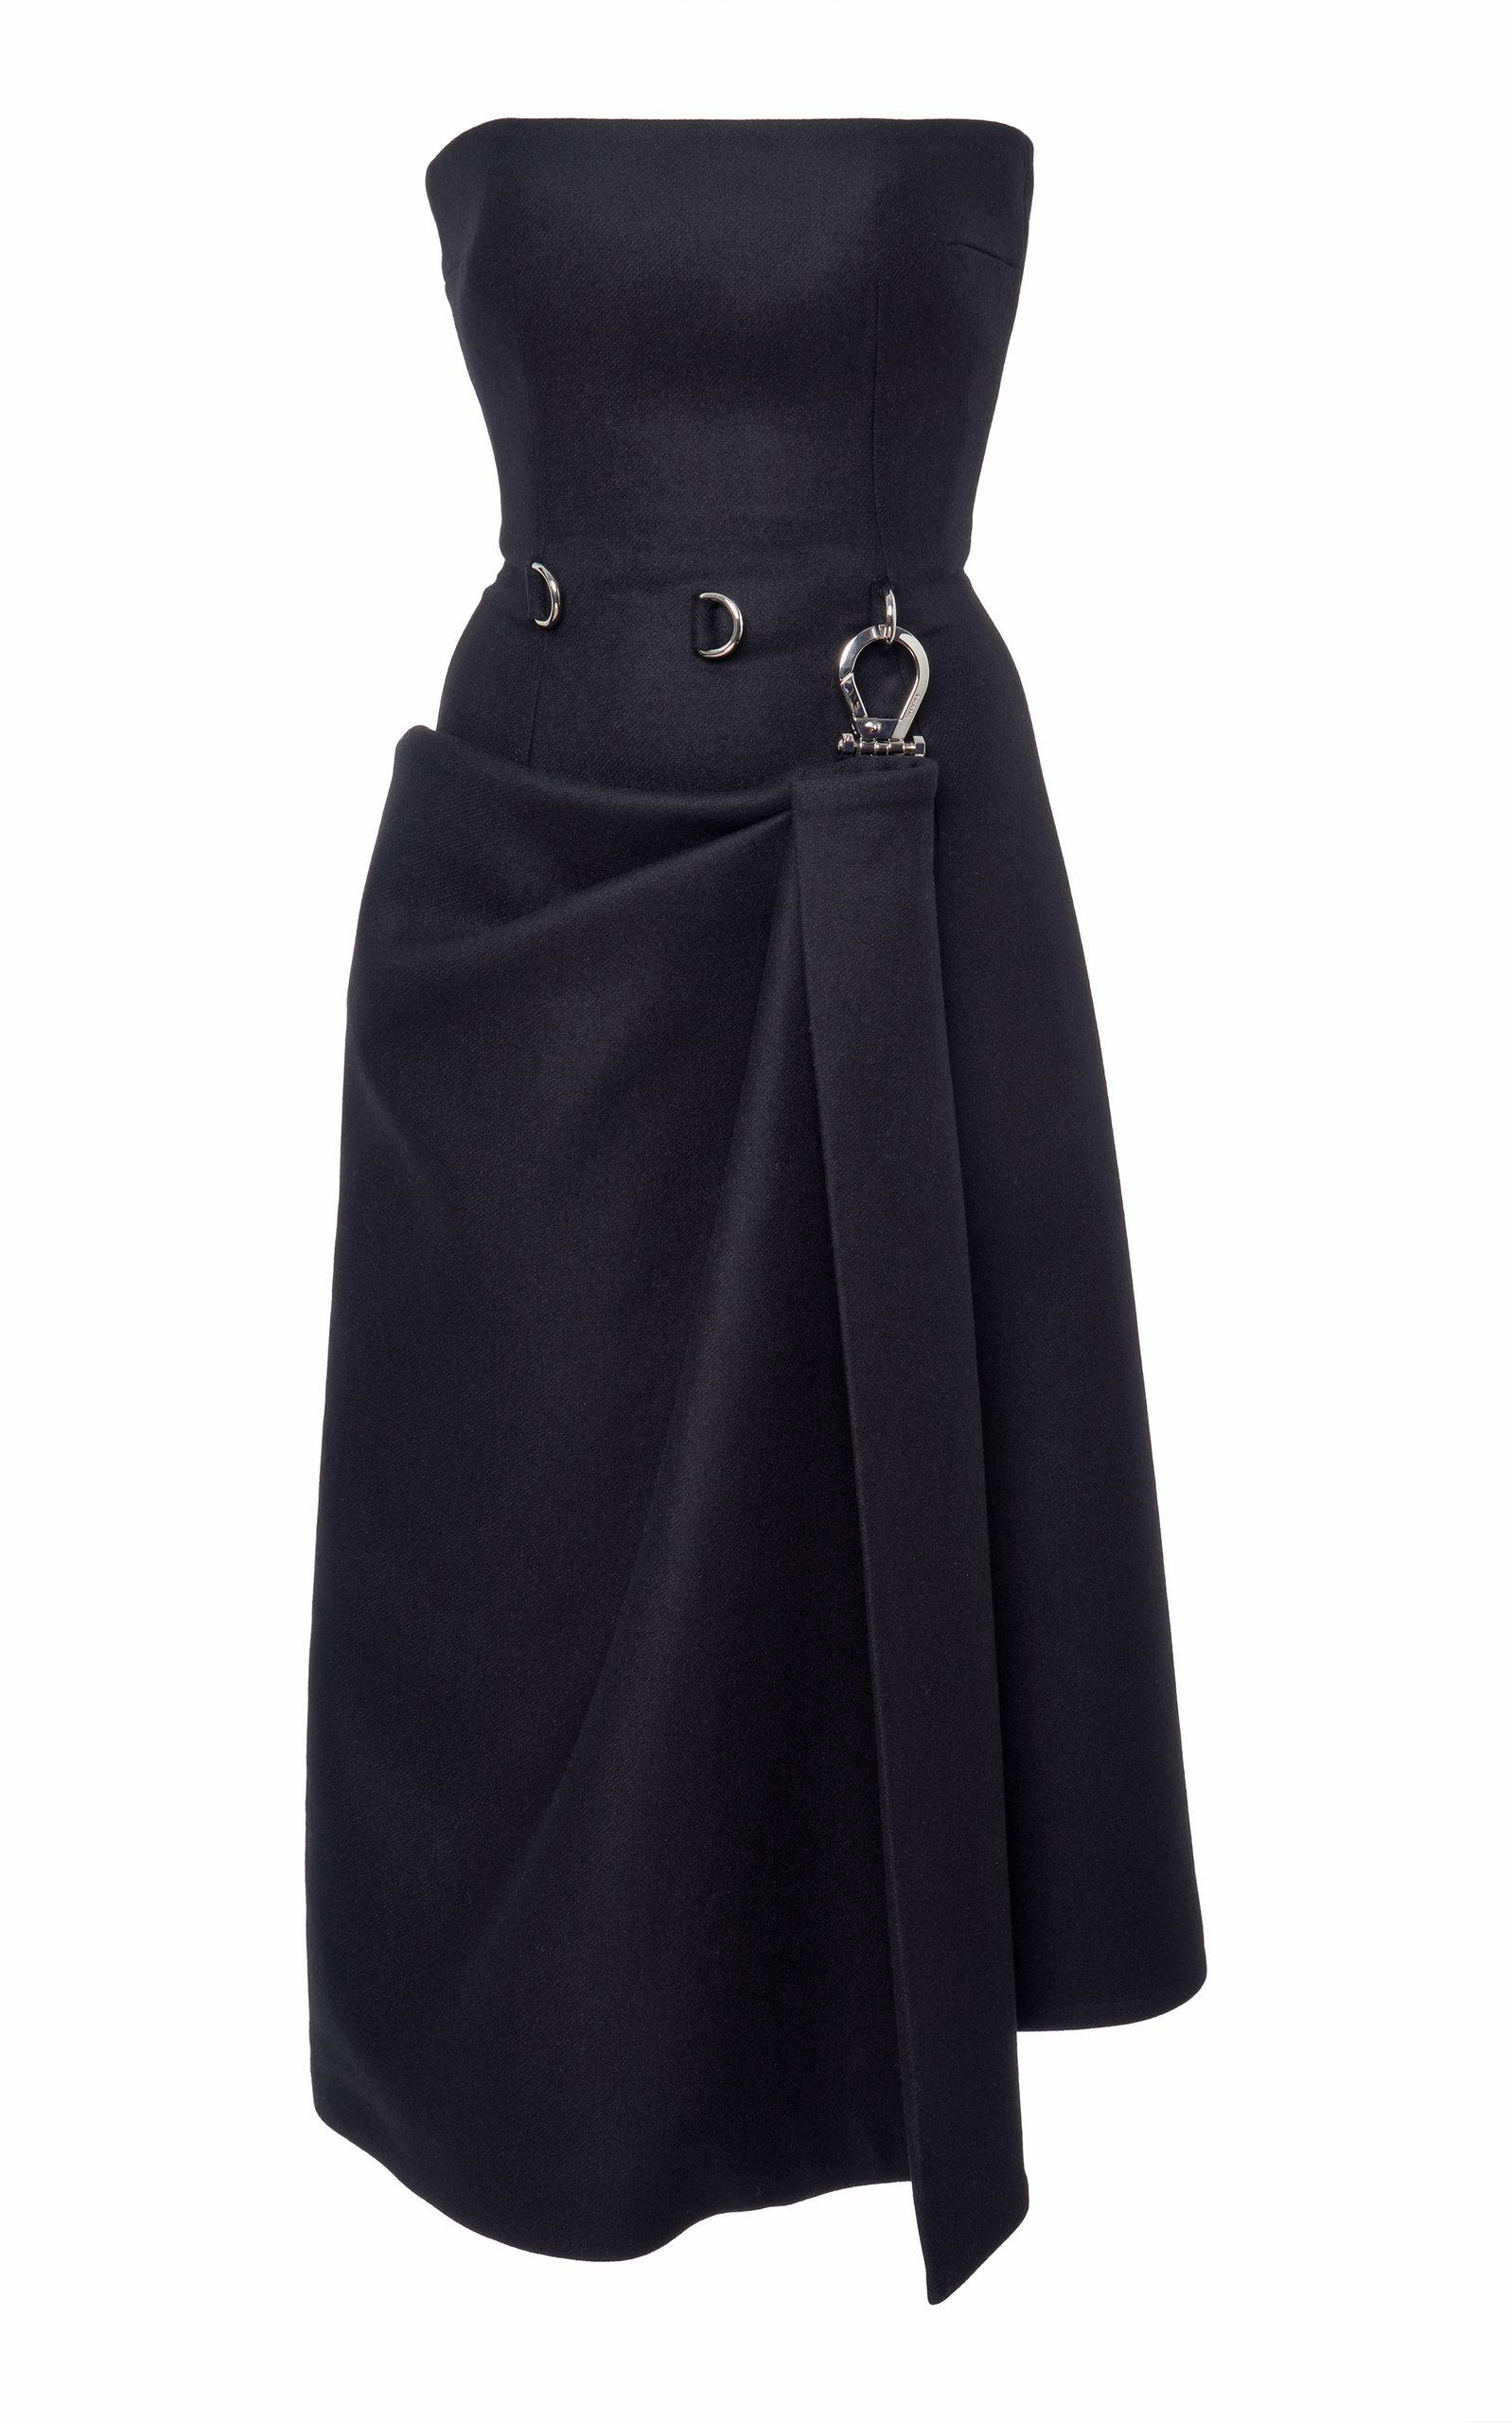 Buy Prada Strapless Wool-Crepe Corset Dress online, shop Prada at the best price